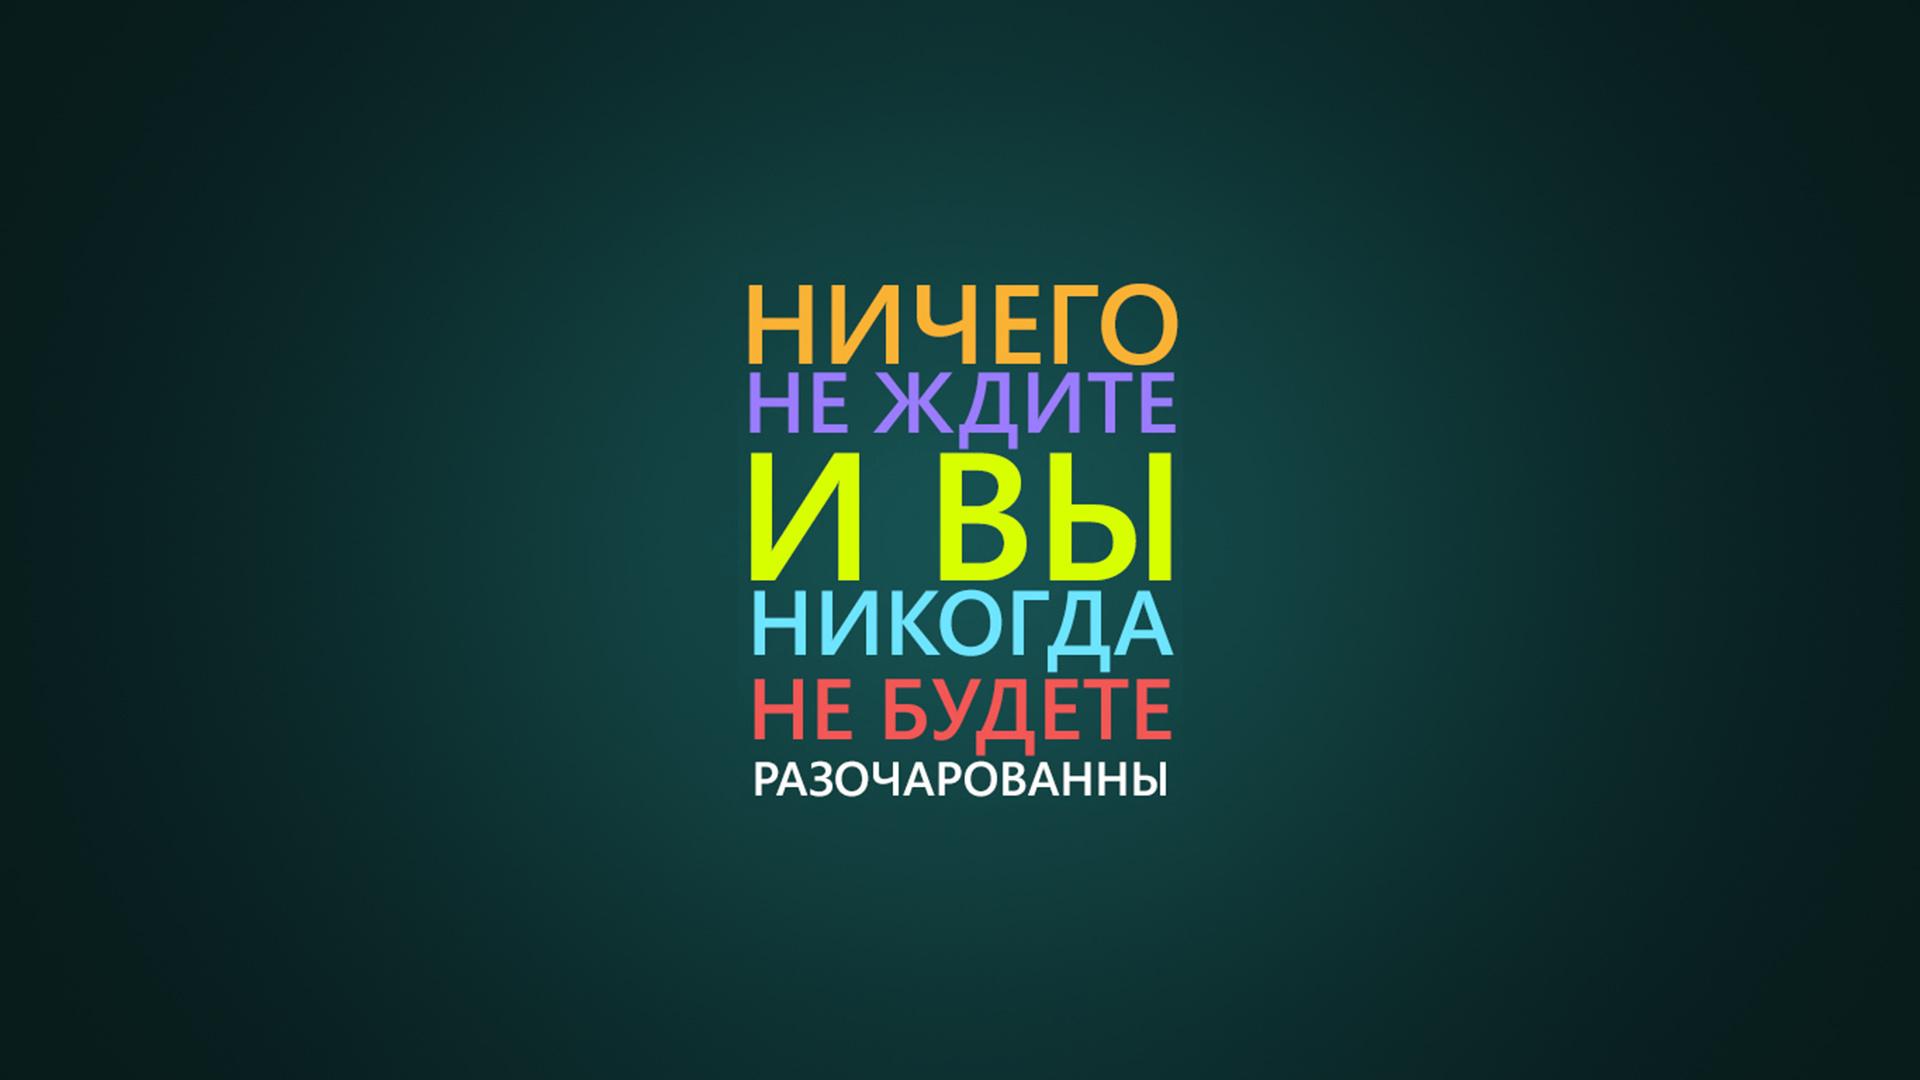 тоже самое обои с цитатами на телефон любовь